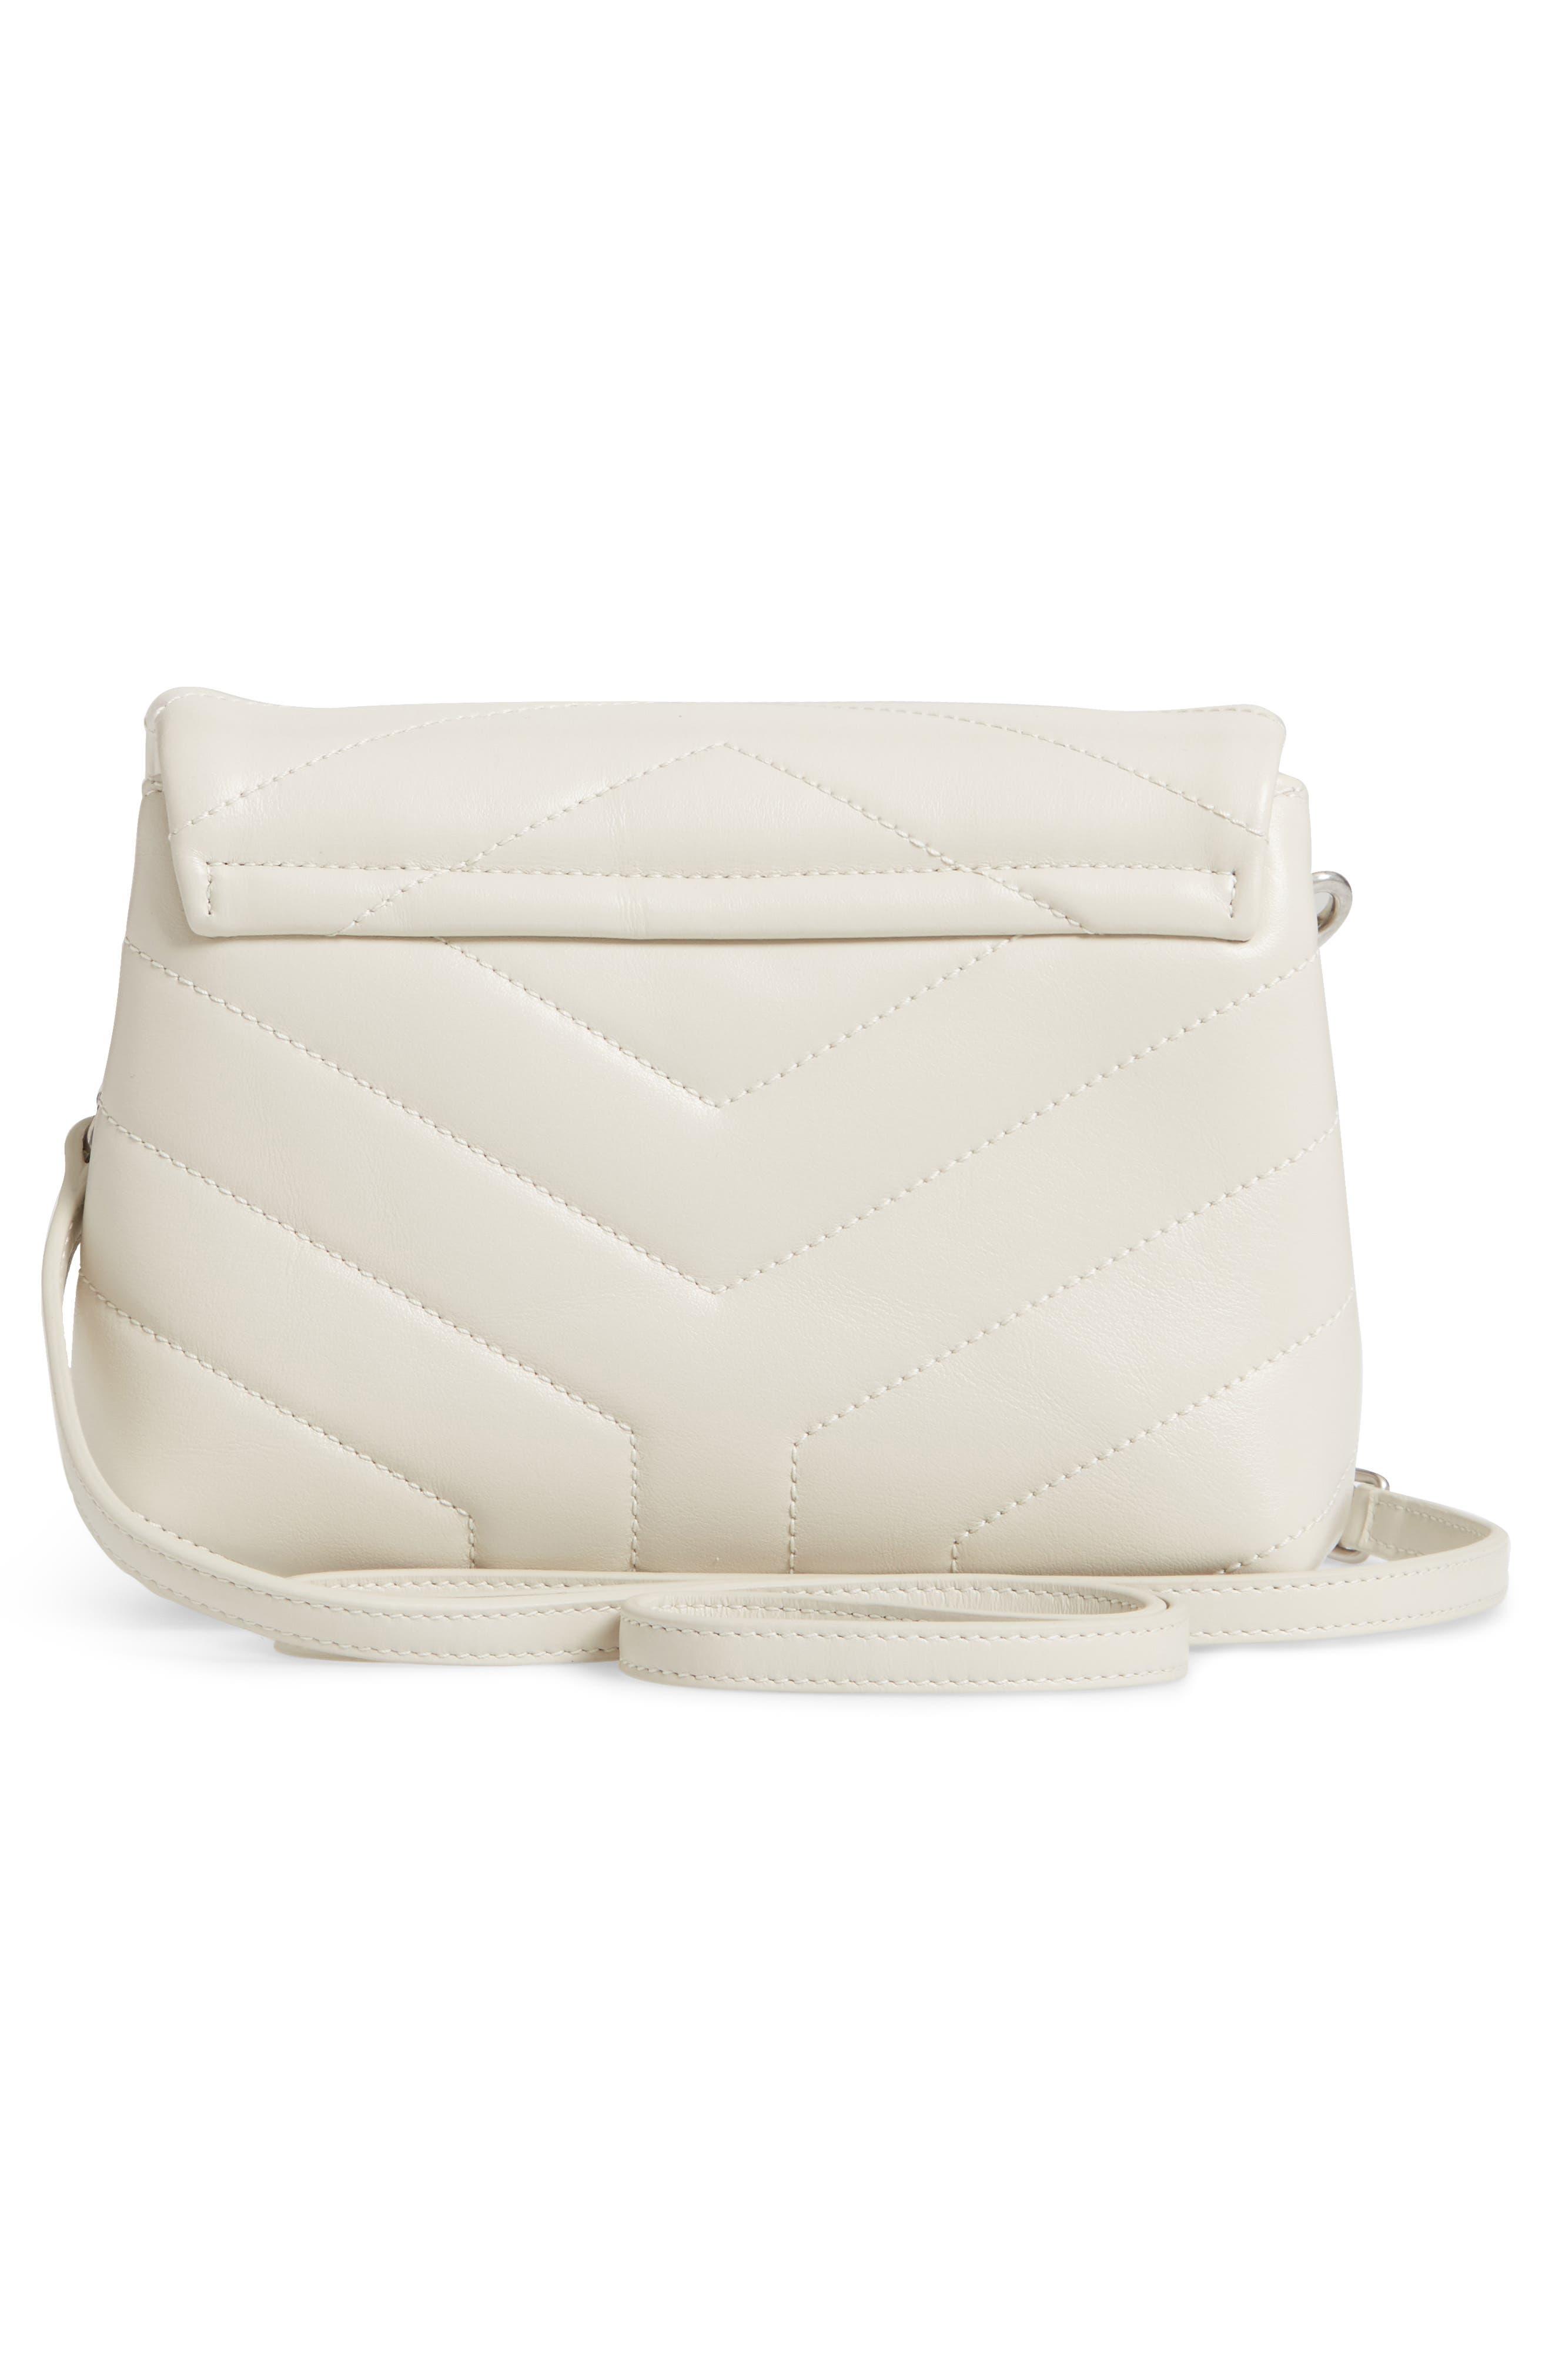 SAINT LAURENT, Toy Loulou Calfskin Leather Crossbody Bag, Alternate thumbnail 3, color, CREMA SOFT